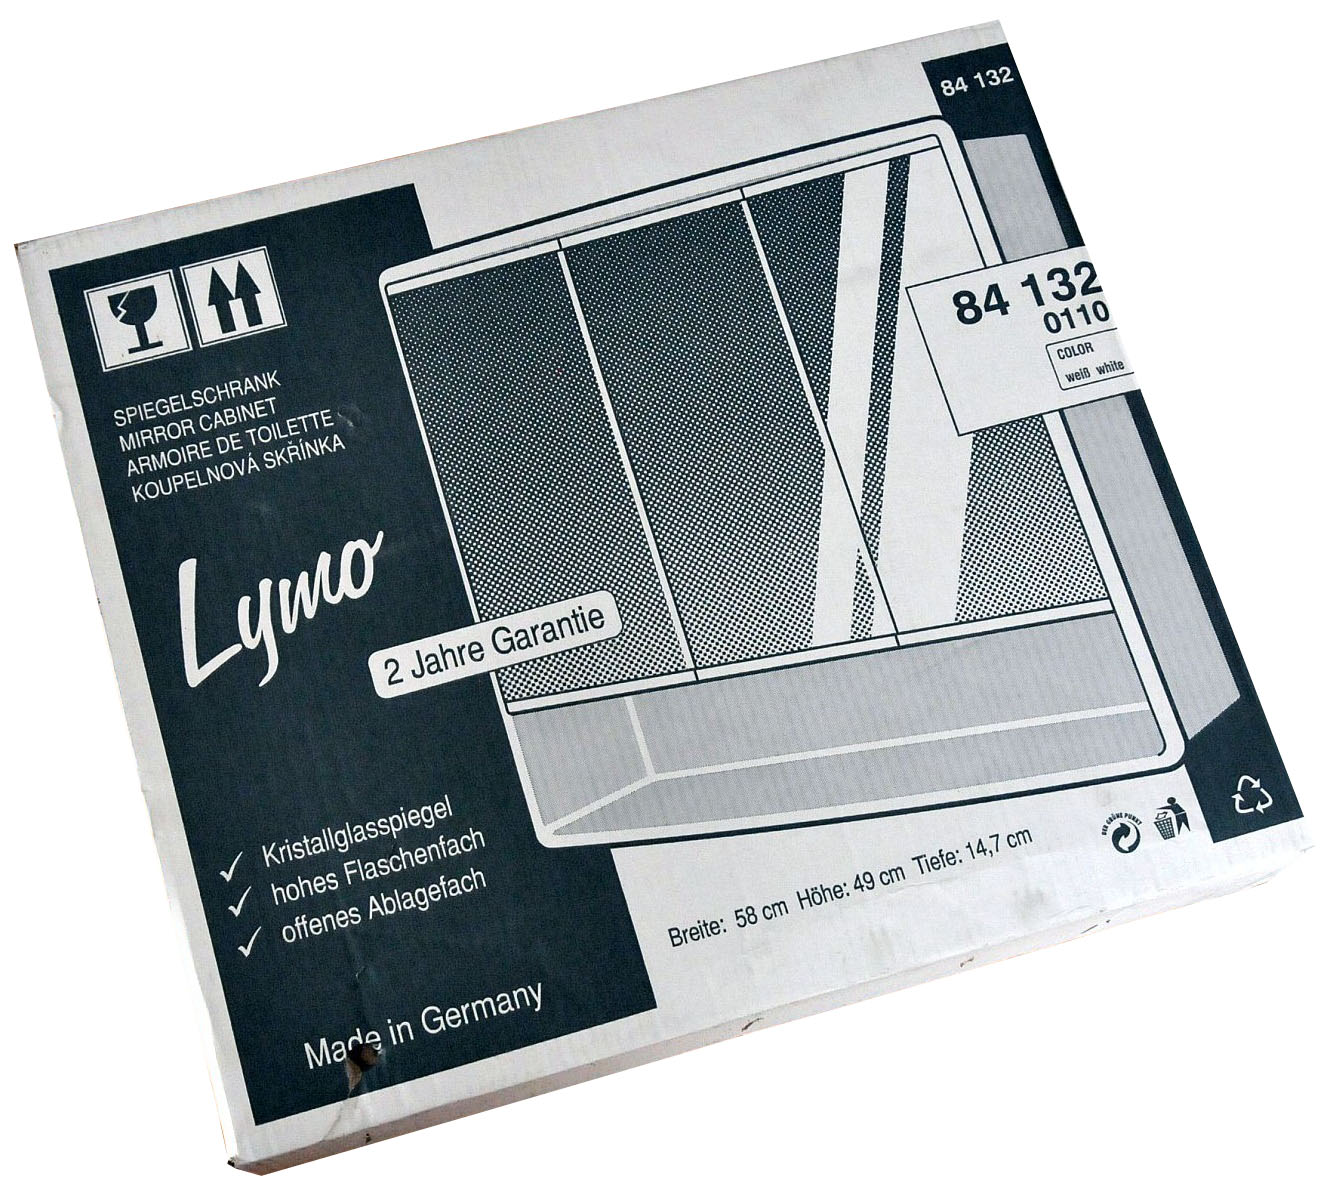 jokey spiegelschrank lymo wei 188413200 0110 pictures to pin on pinterest. Black Bedroom Furniture Sets. Home Design Ideas